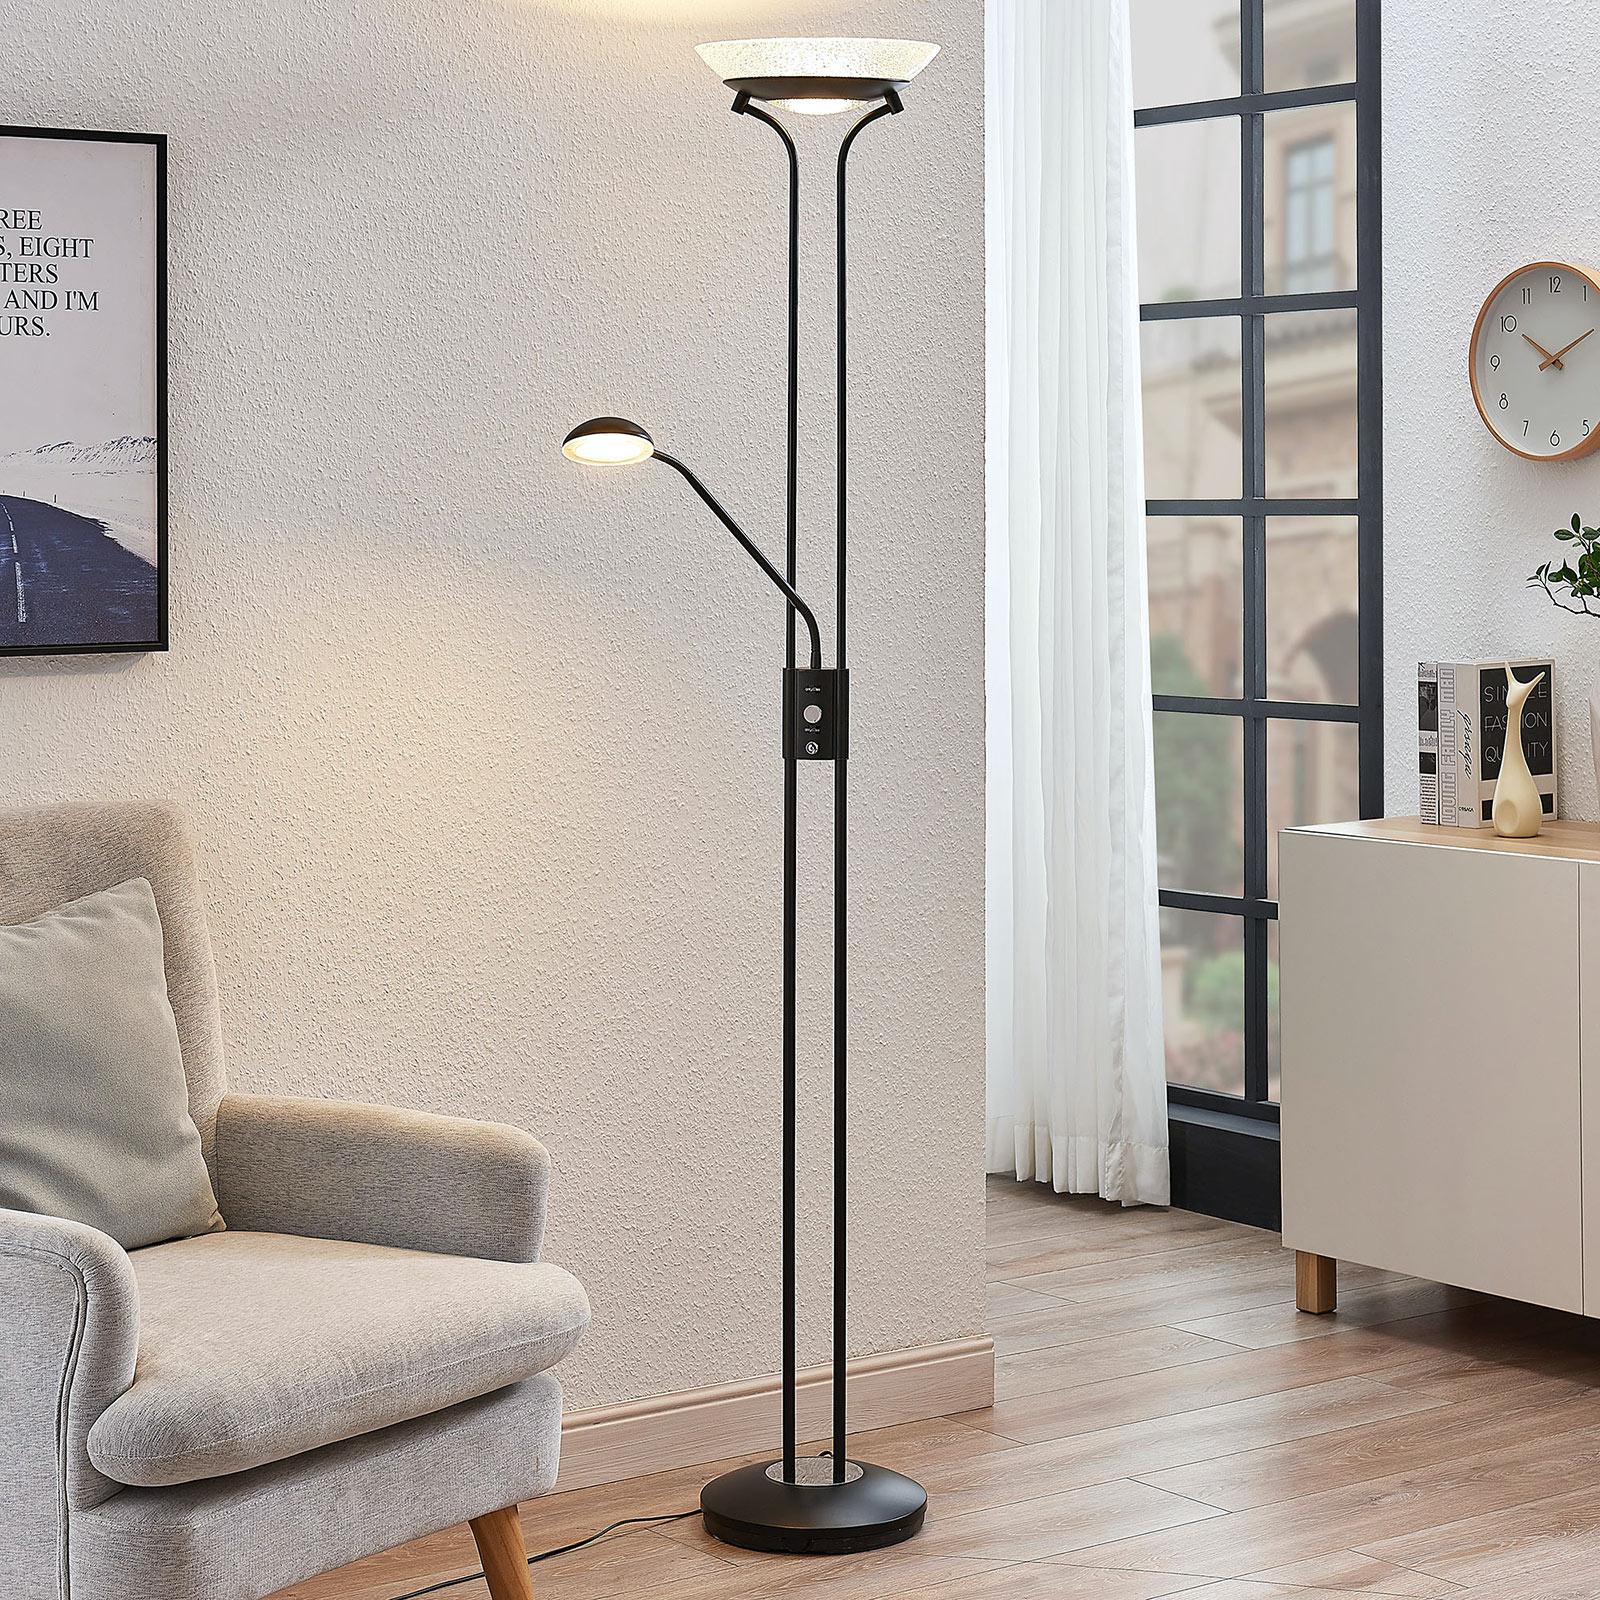 Lampadaire indirect LED Dimitra liseuse, noir